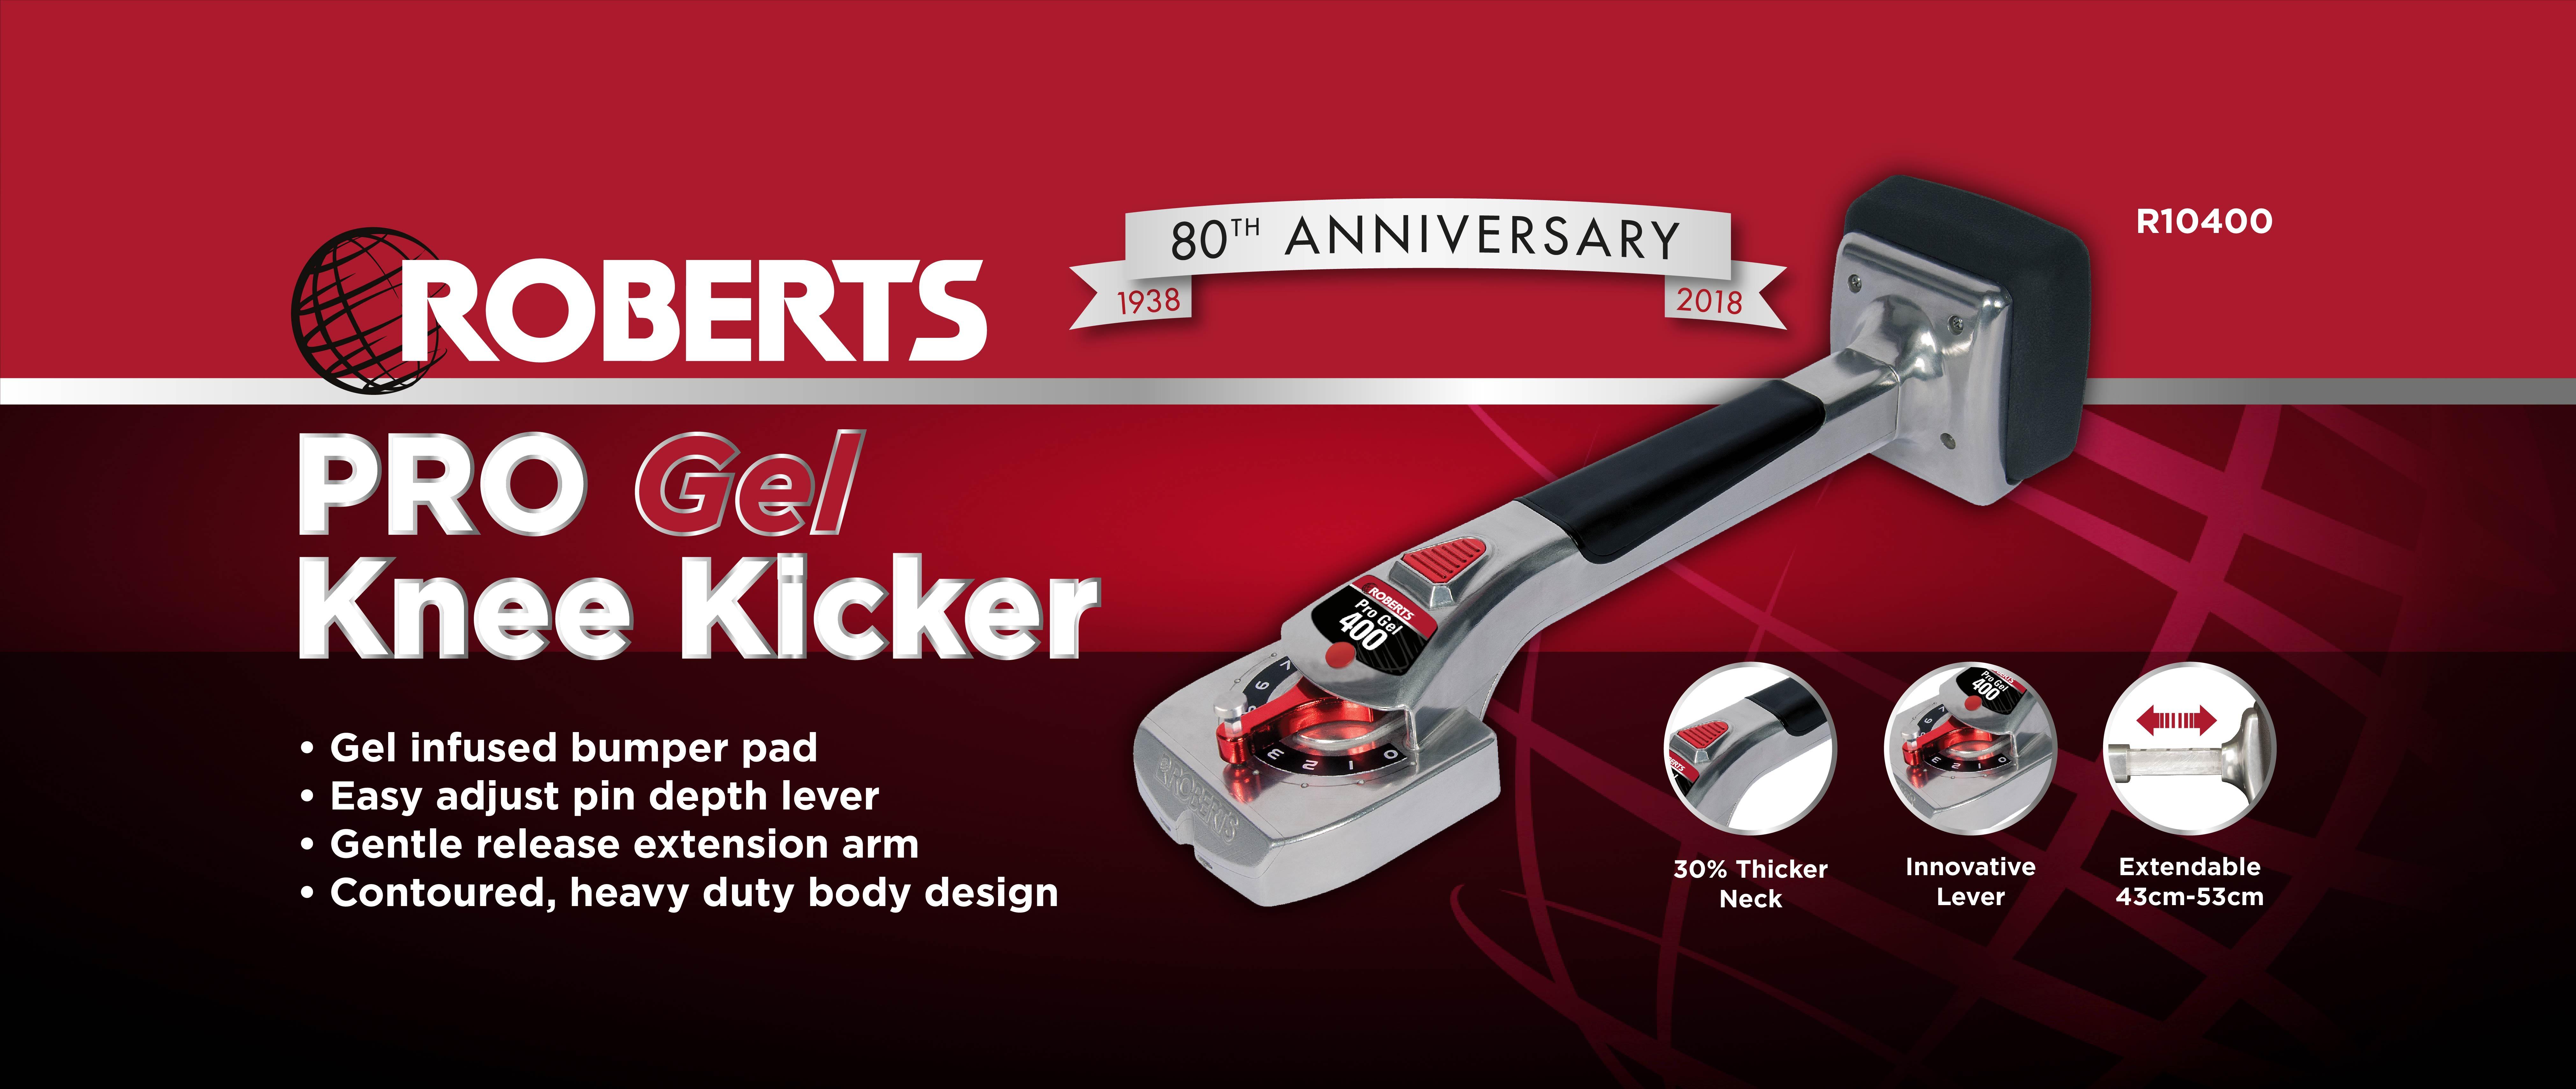 B-R-033-Sliders-for-Roberts-Website-V2-03-03-1